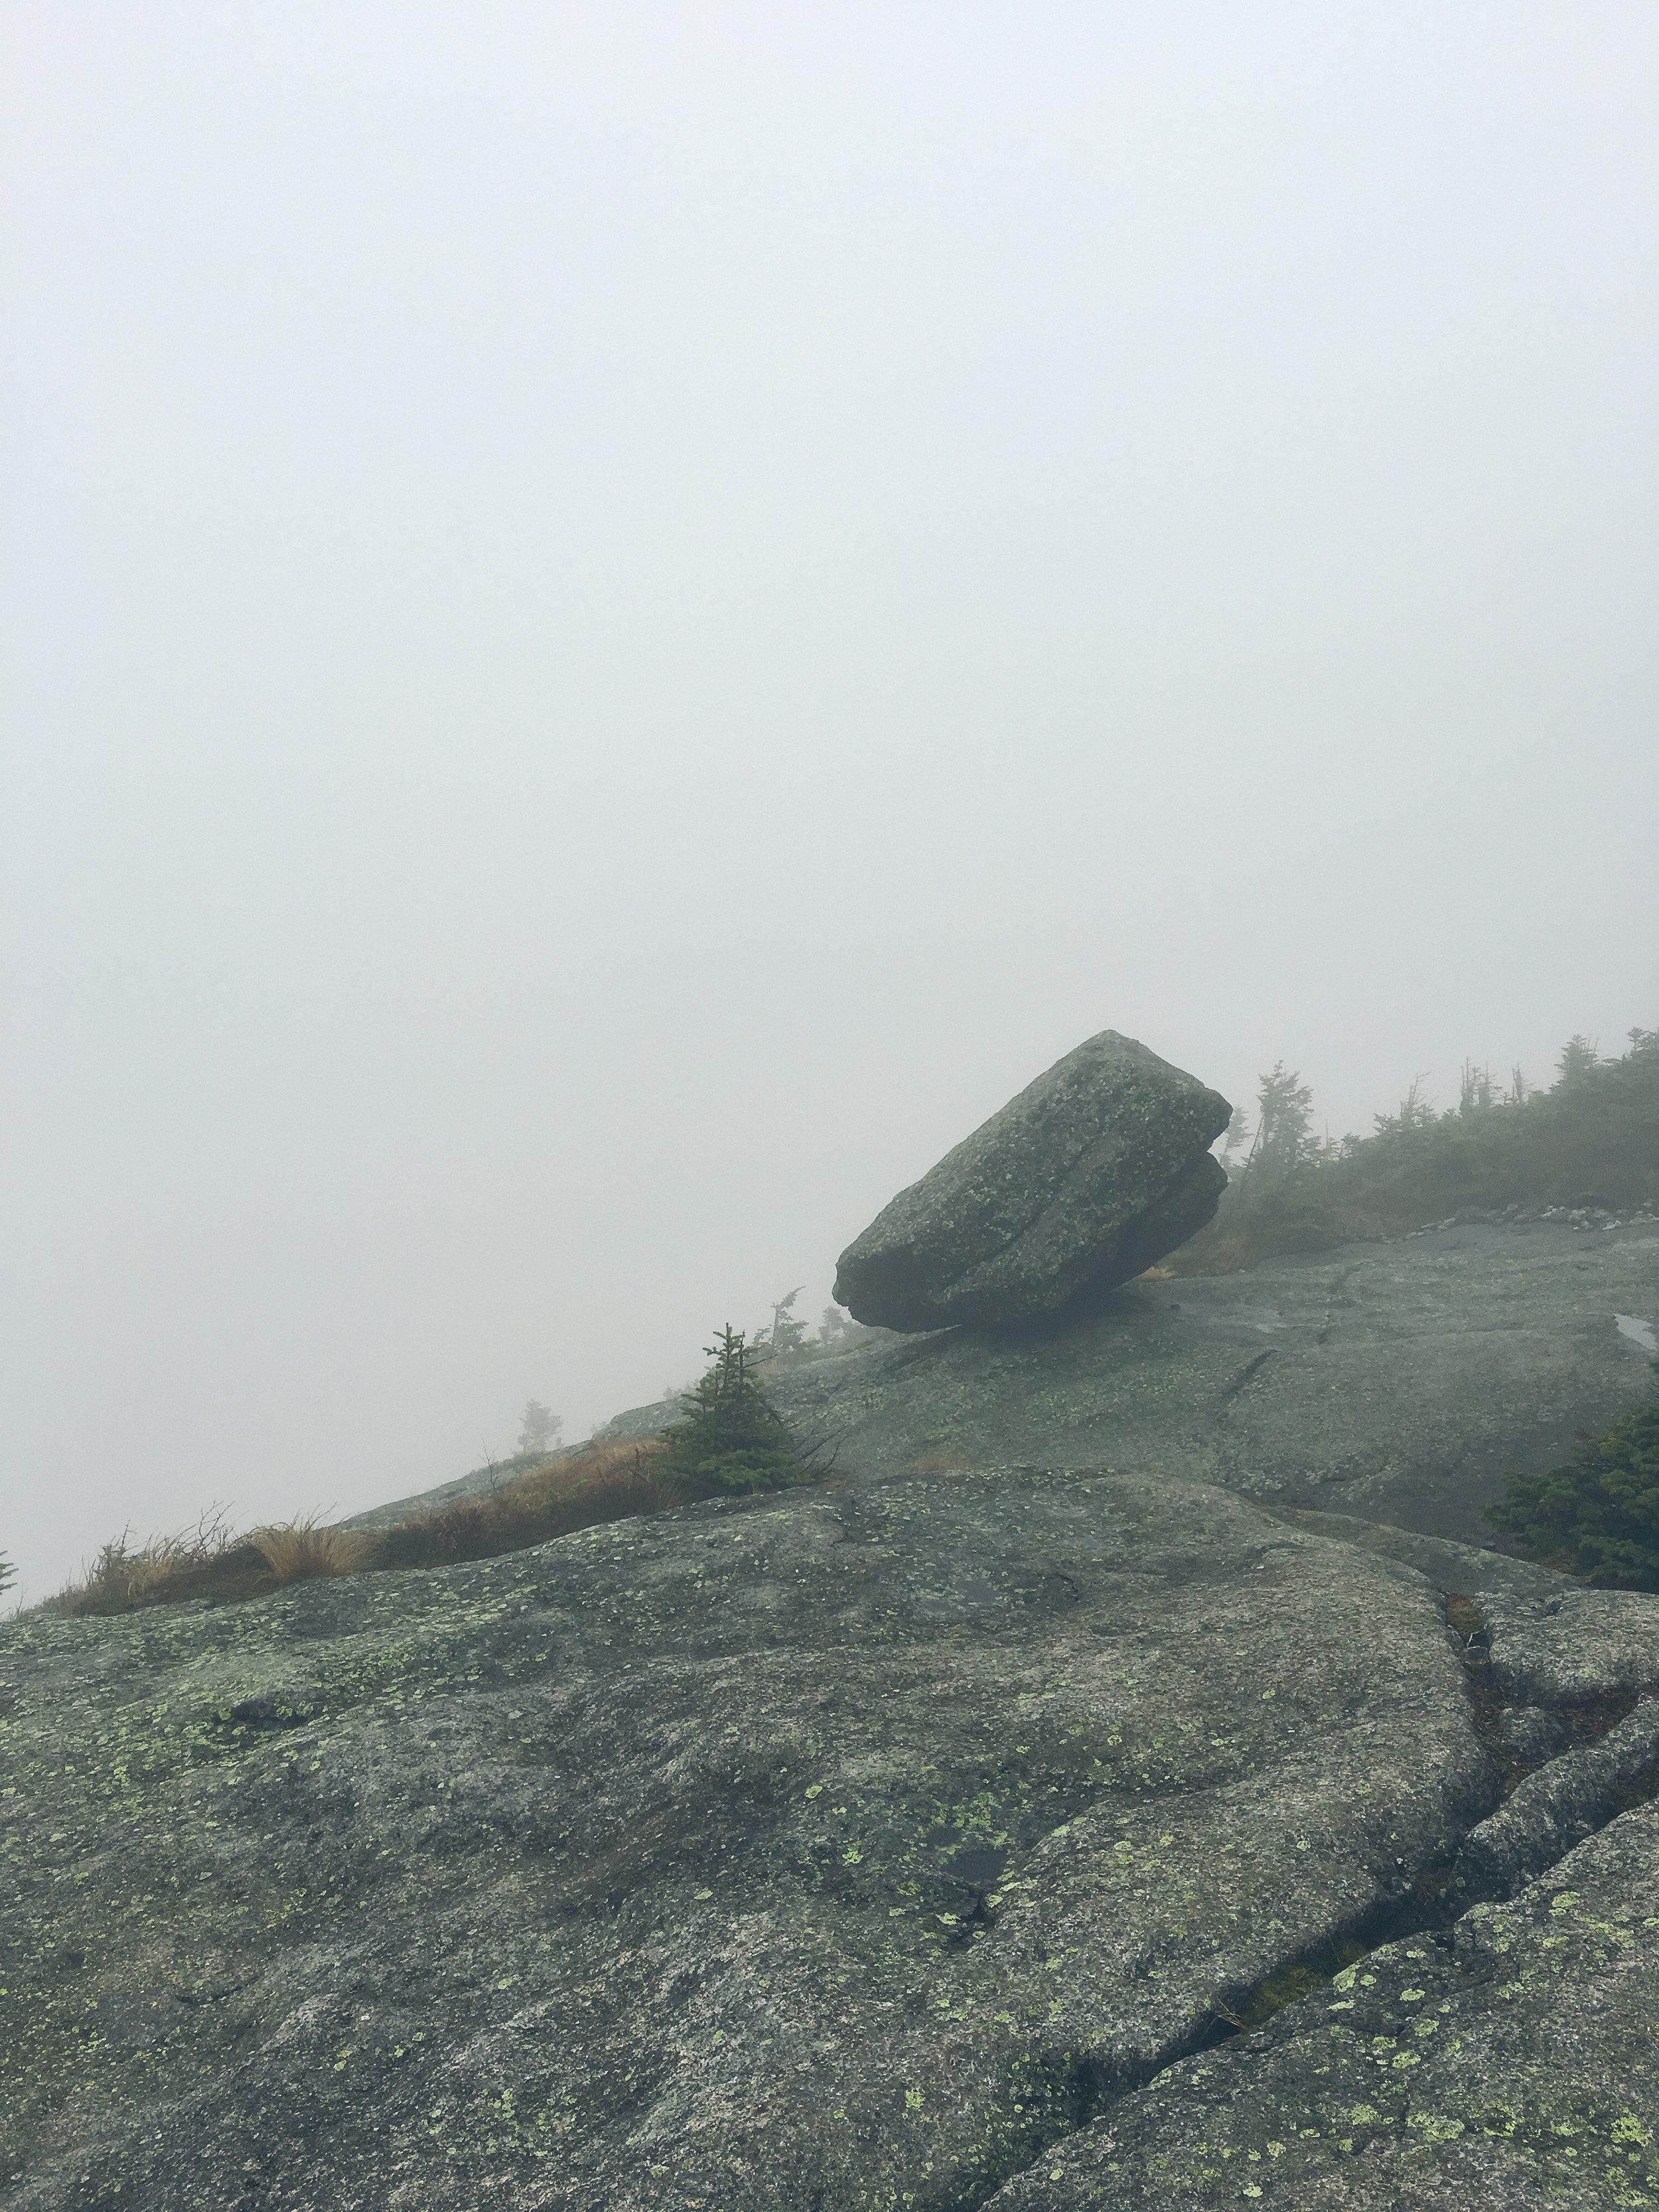 adirondacks-mt-colden-mountain-things (72 of 83).jpg